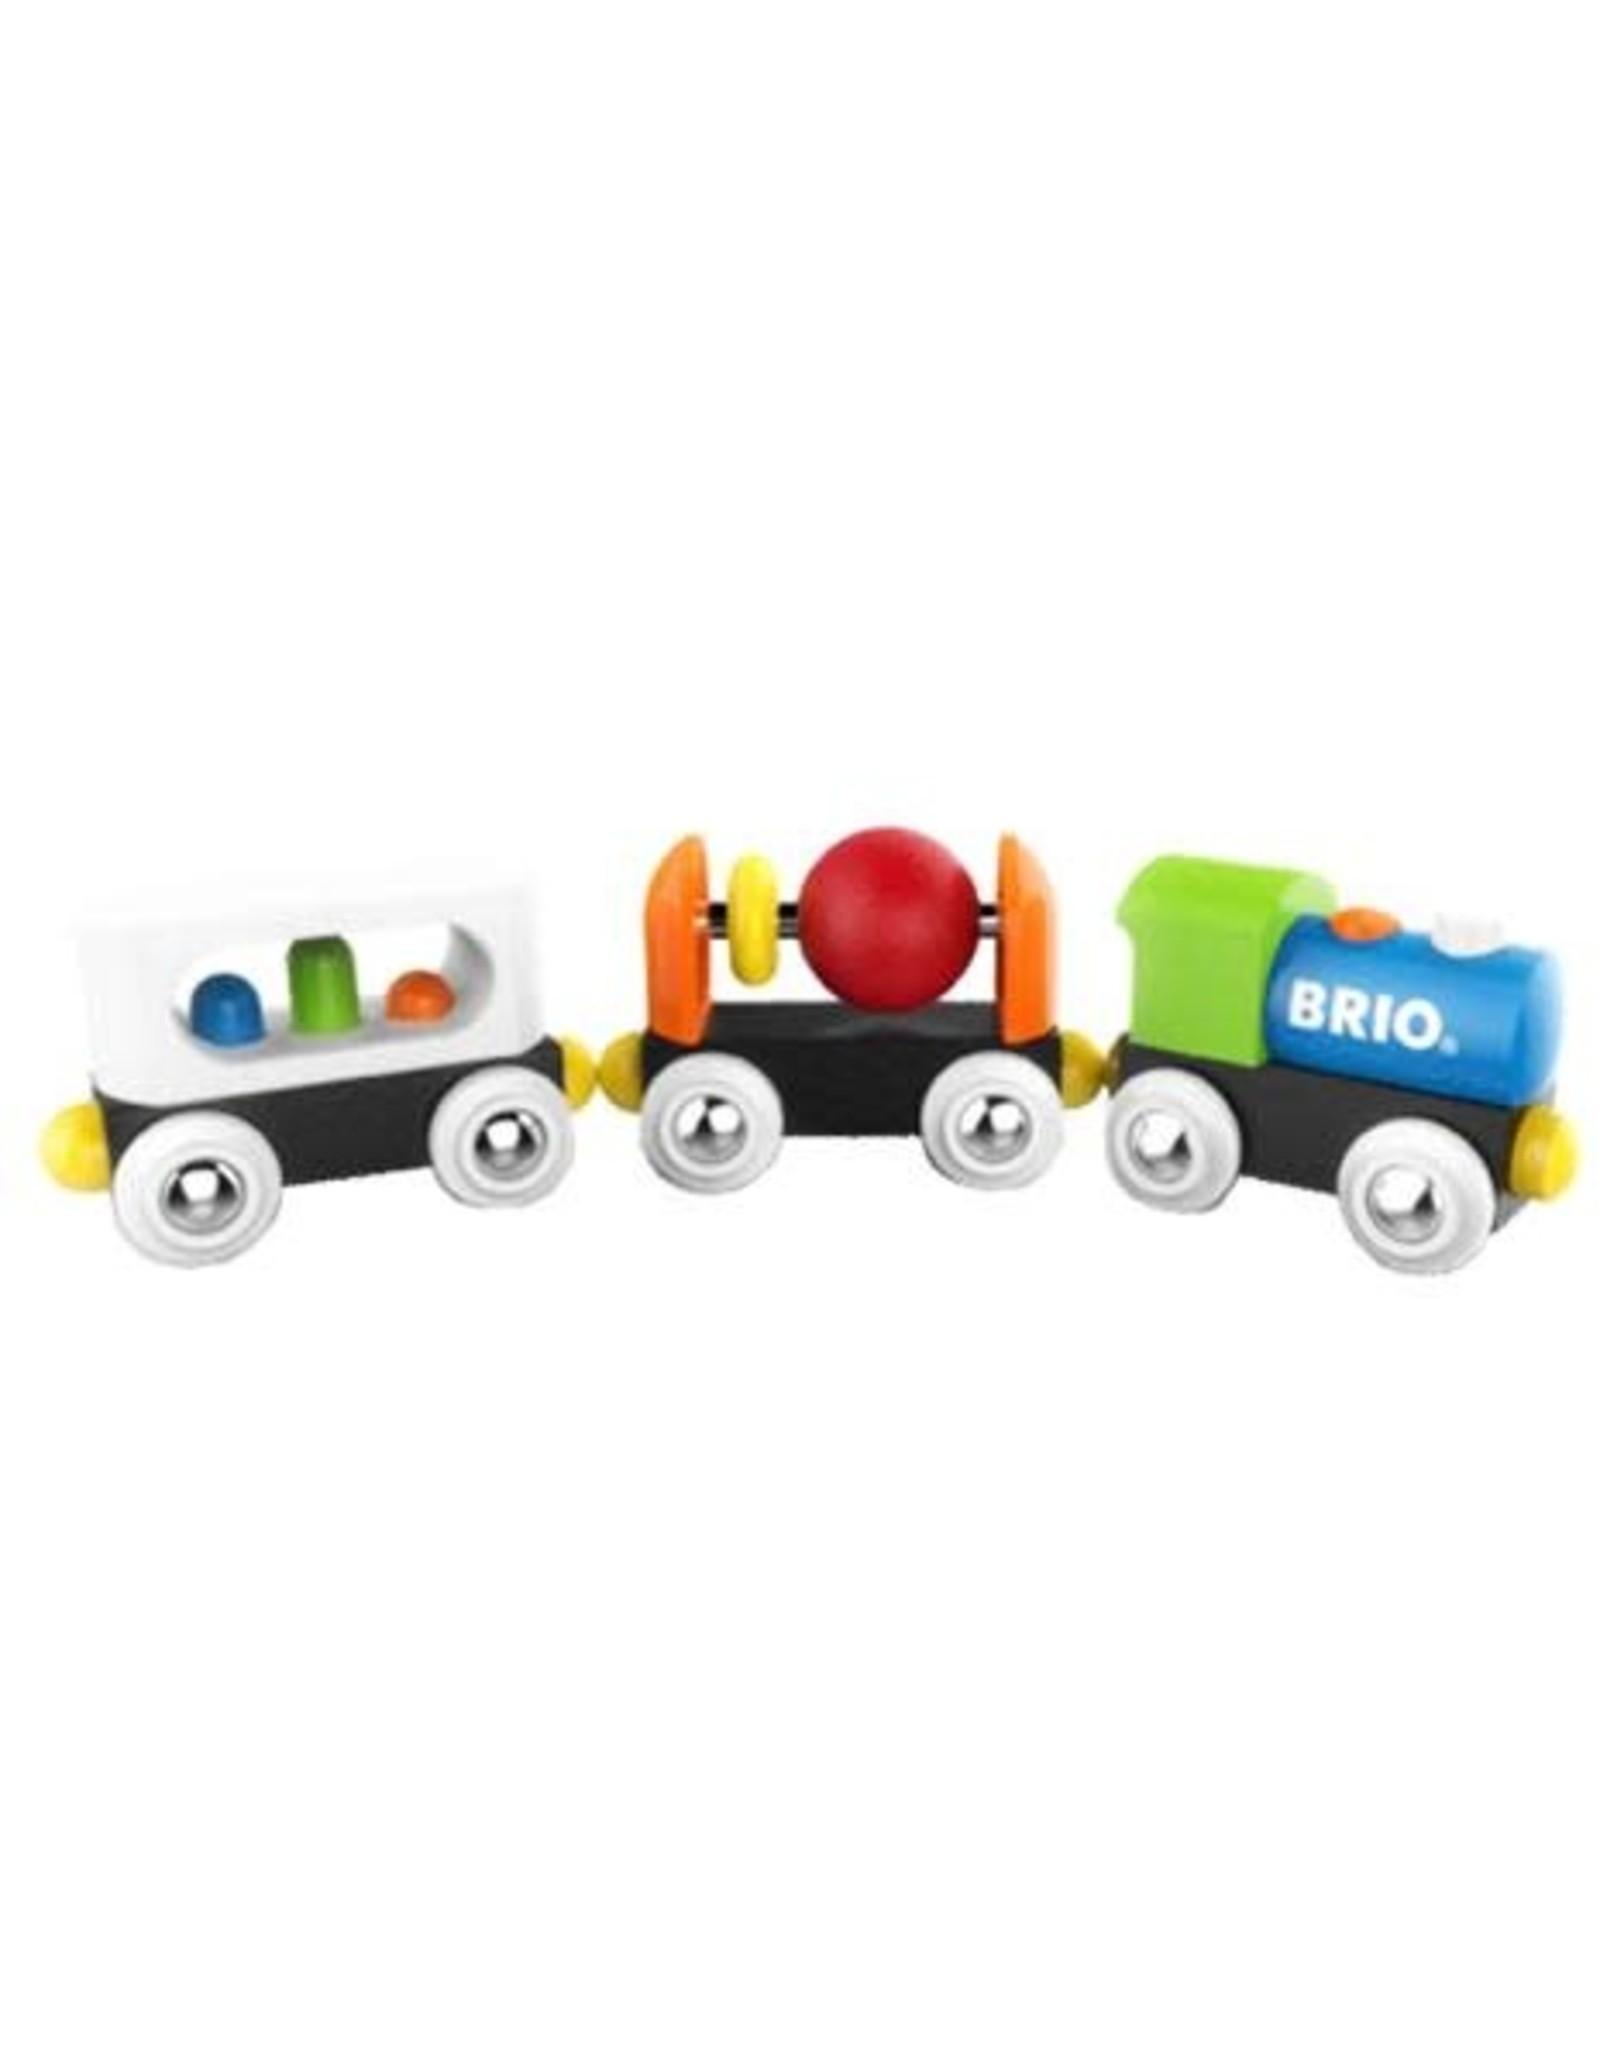 Brio My First Railway Train